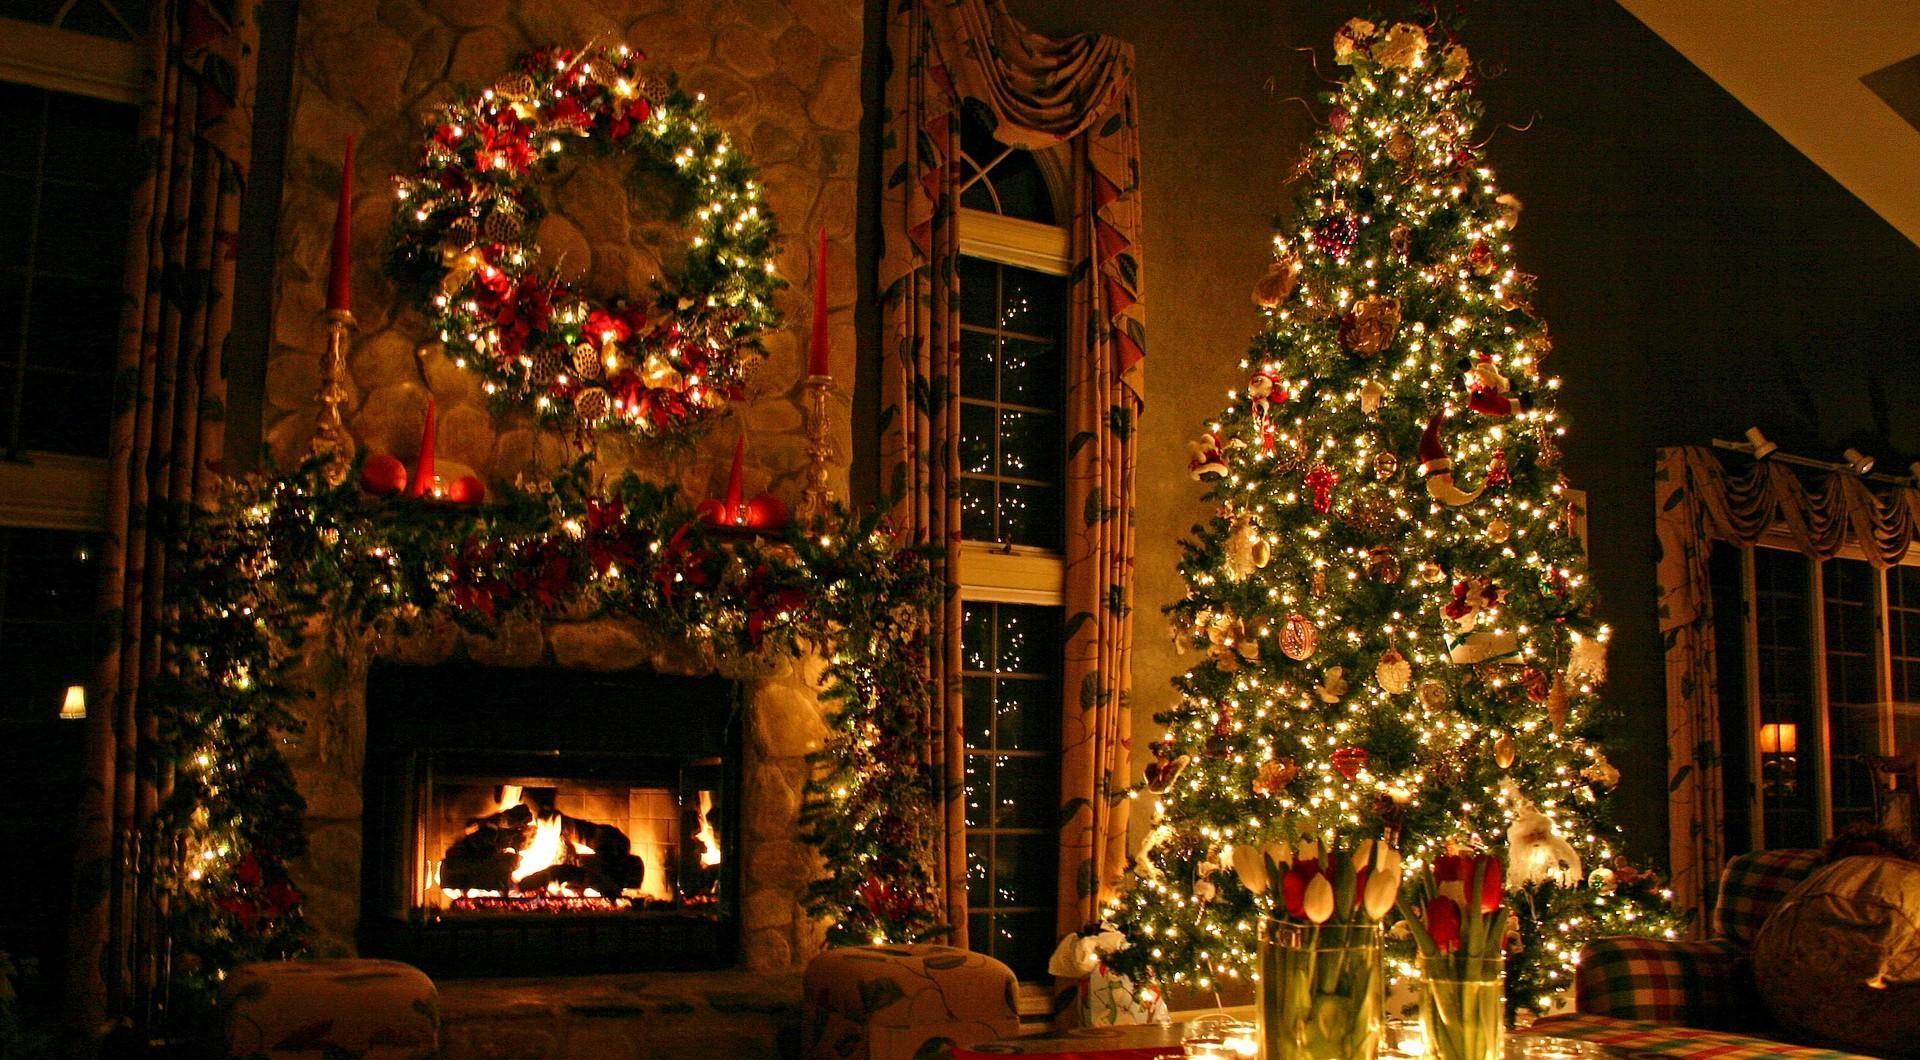 christmas tree ornaments fireplace Wallpaper HD Holidays 4K 1920x1060